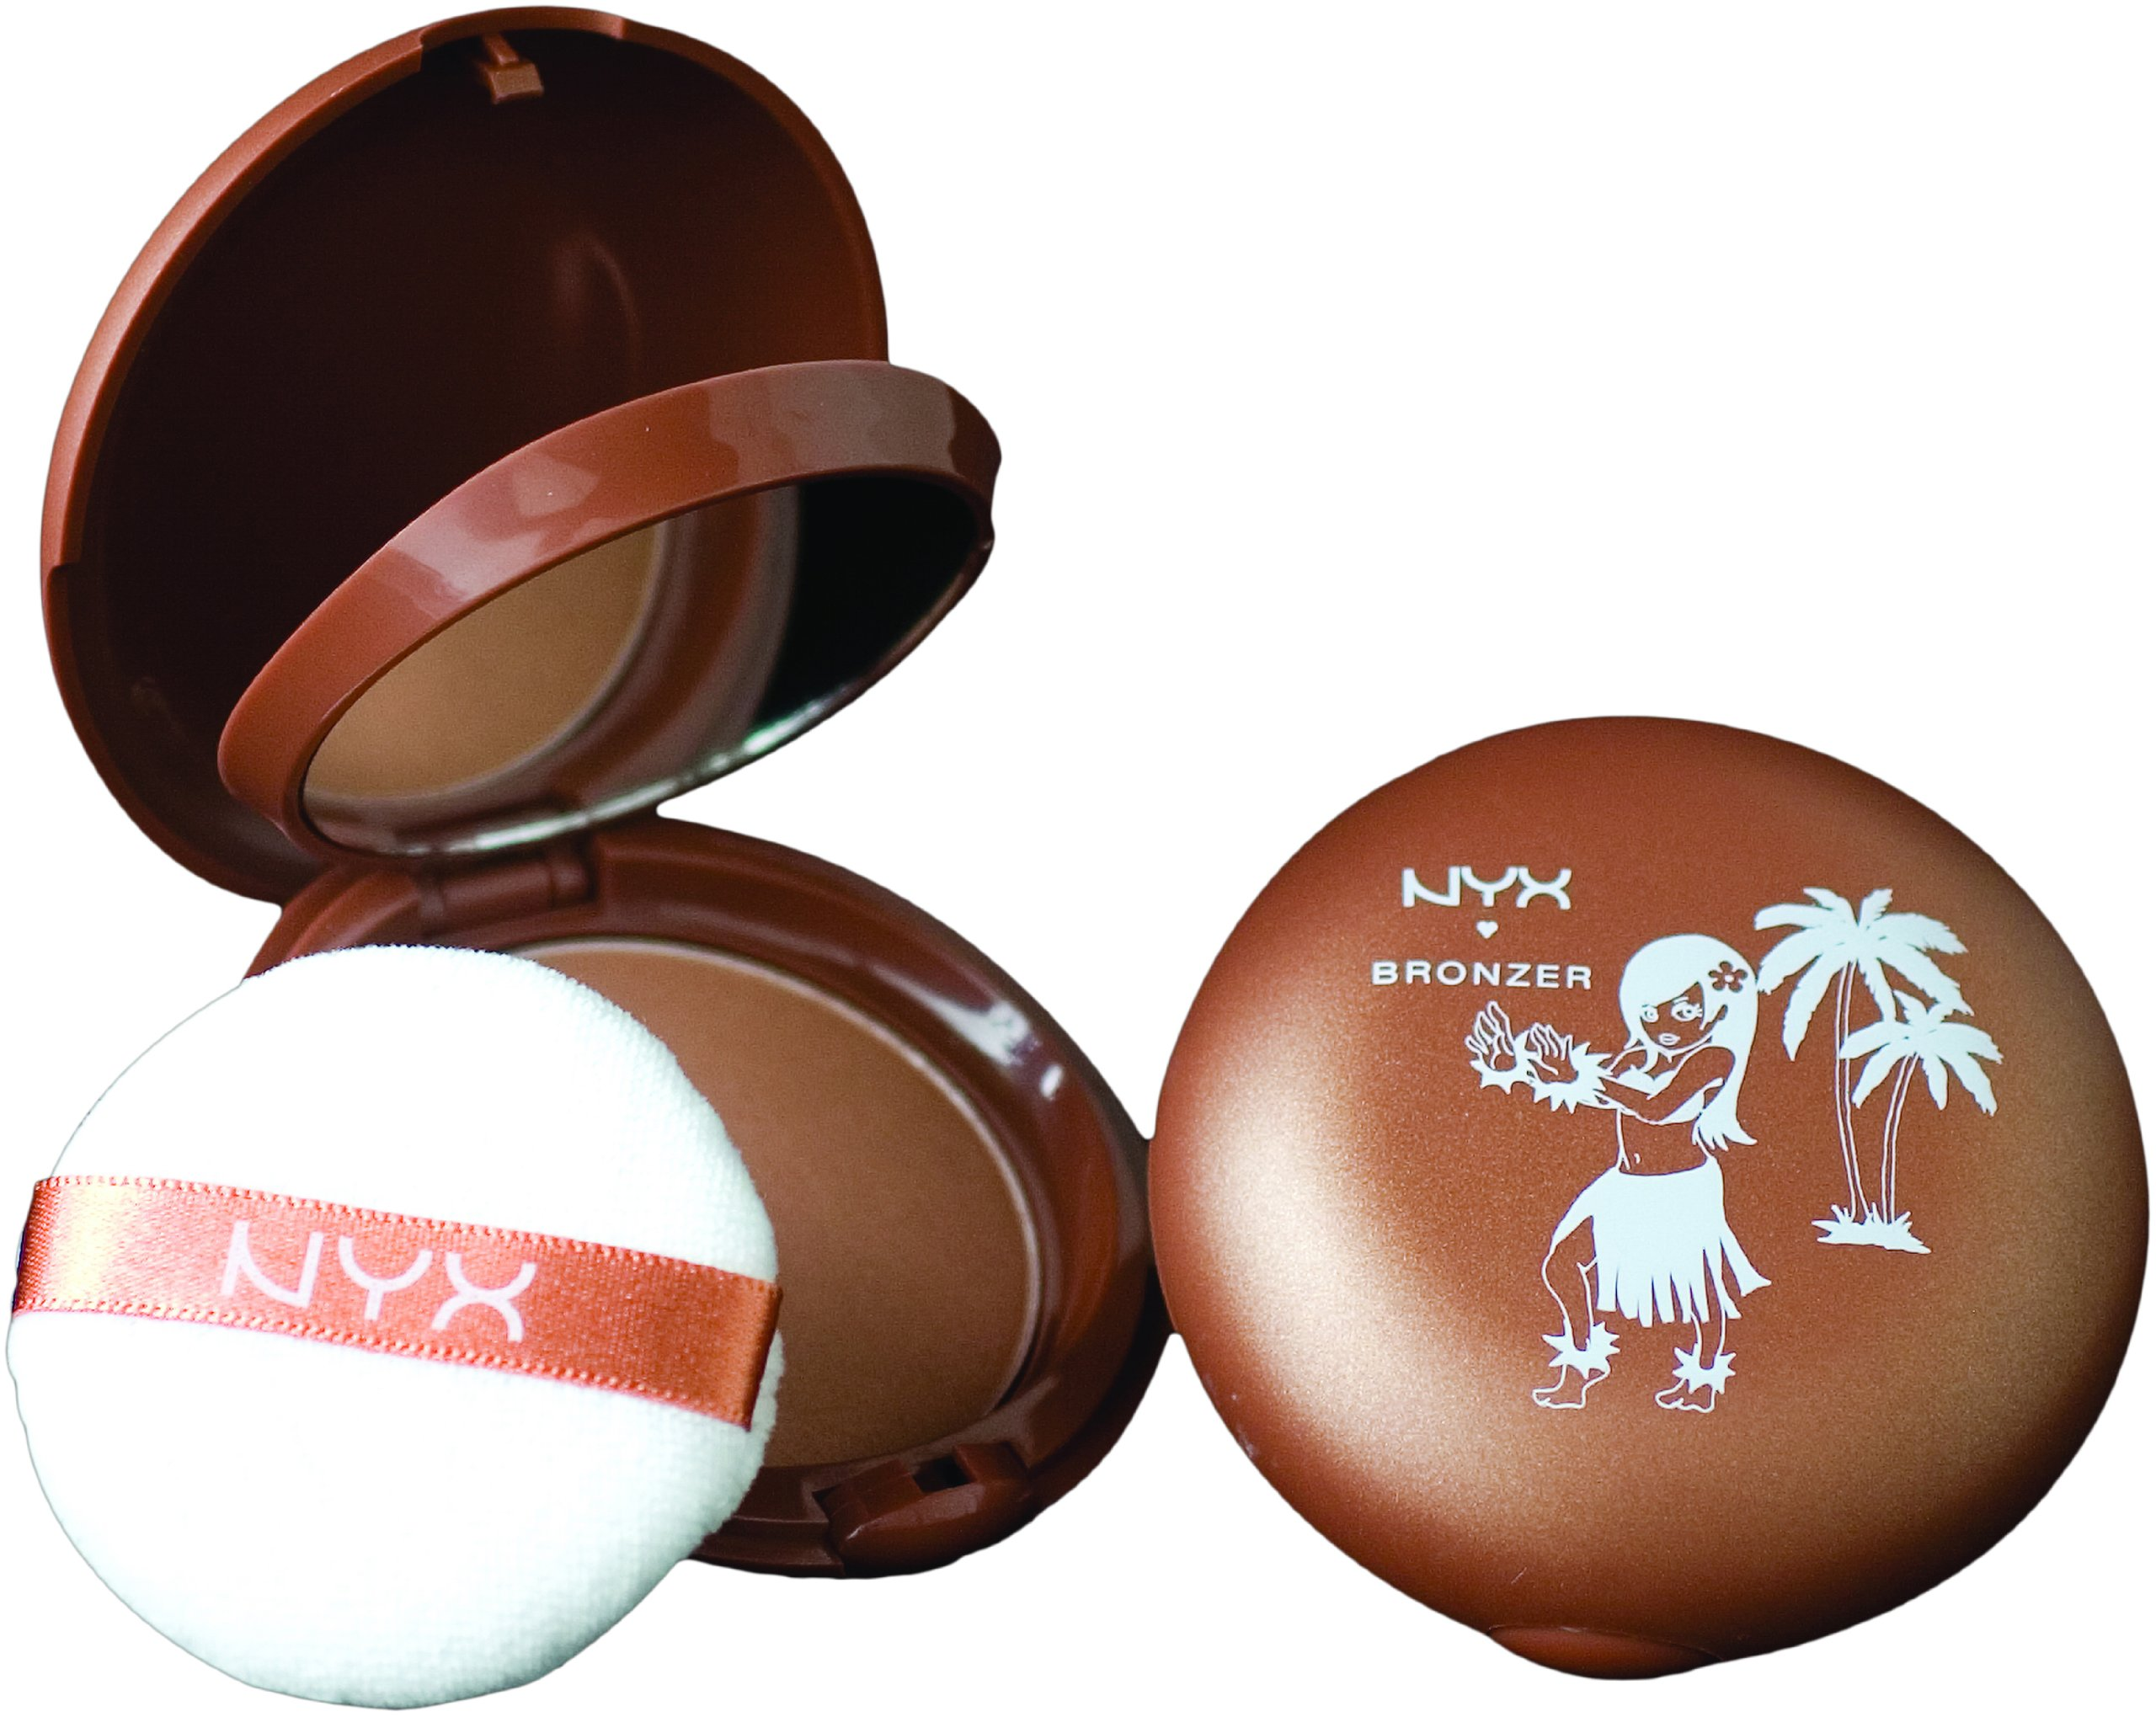 NYX Body Bronzer-NXBB04 Daydream of Lanai